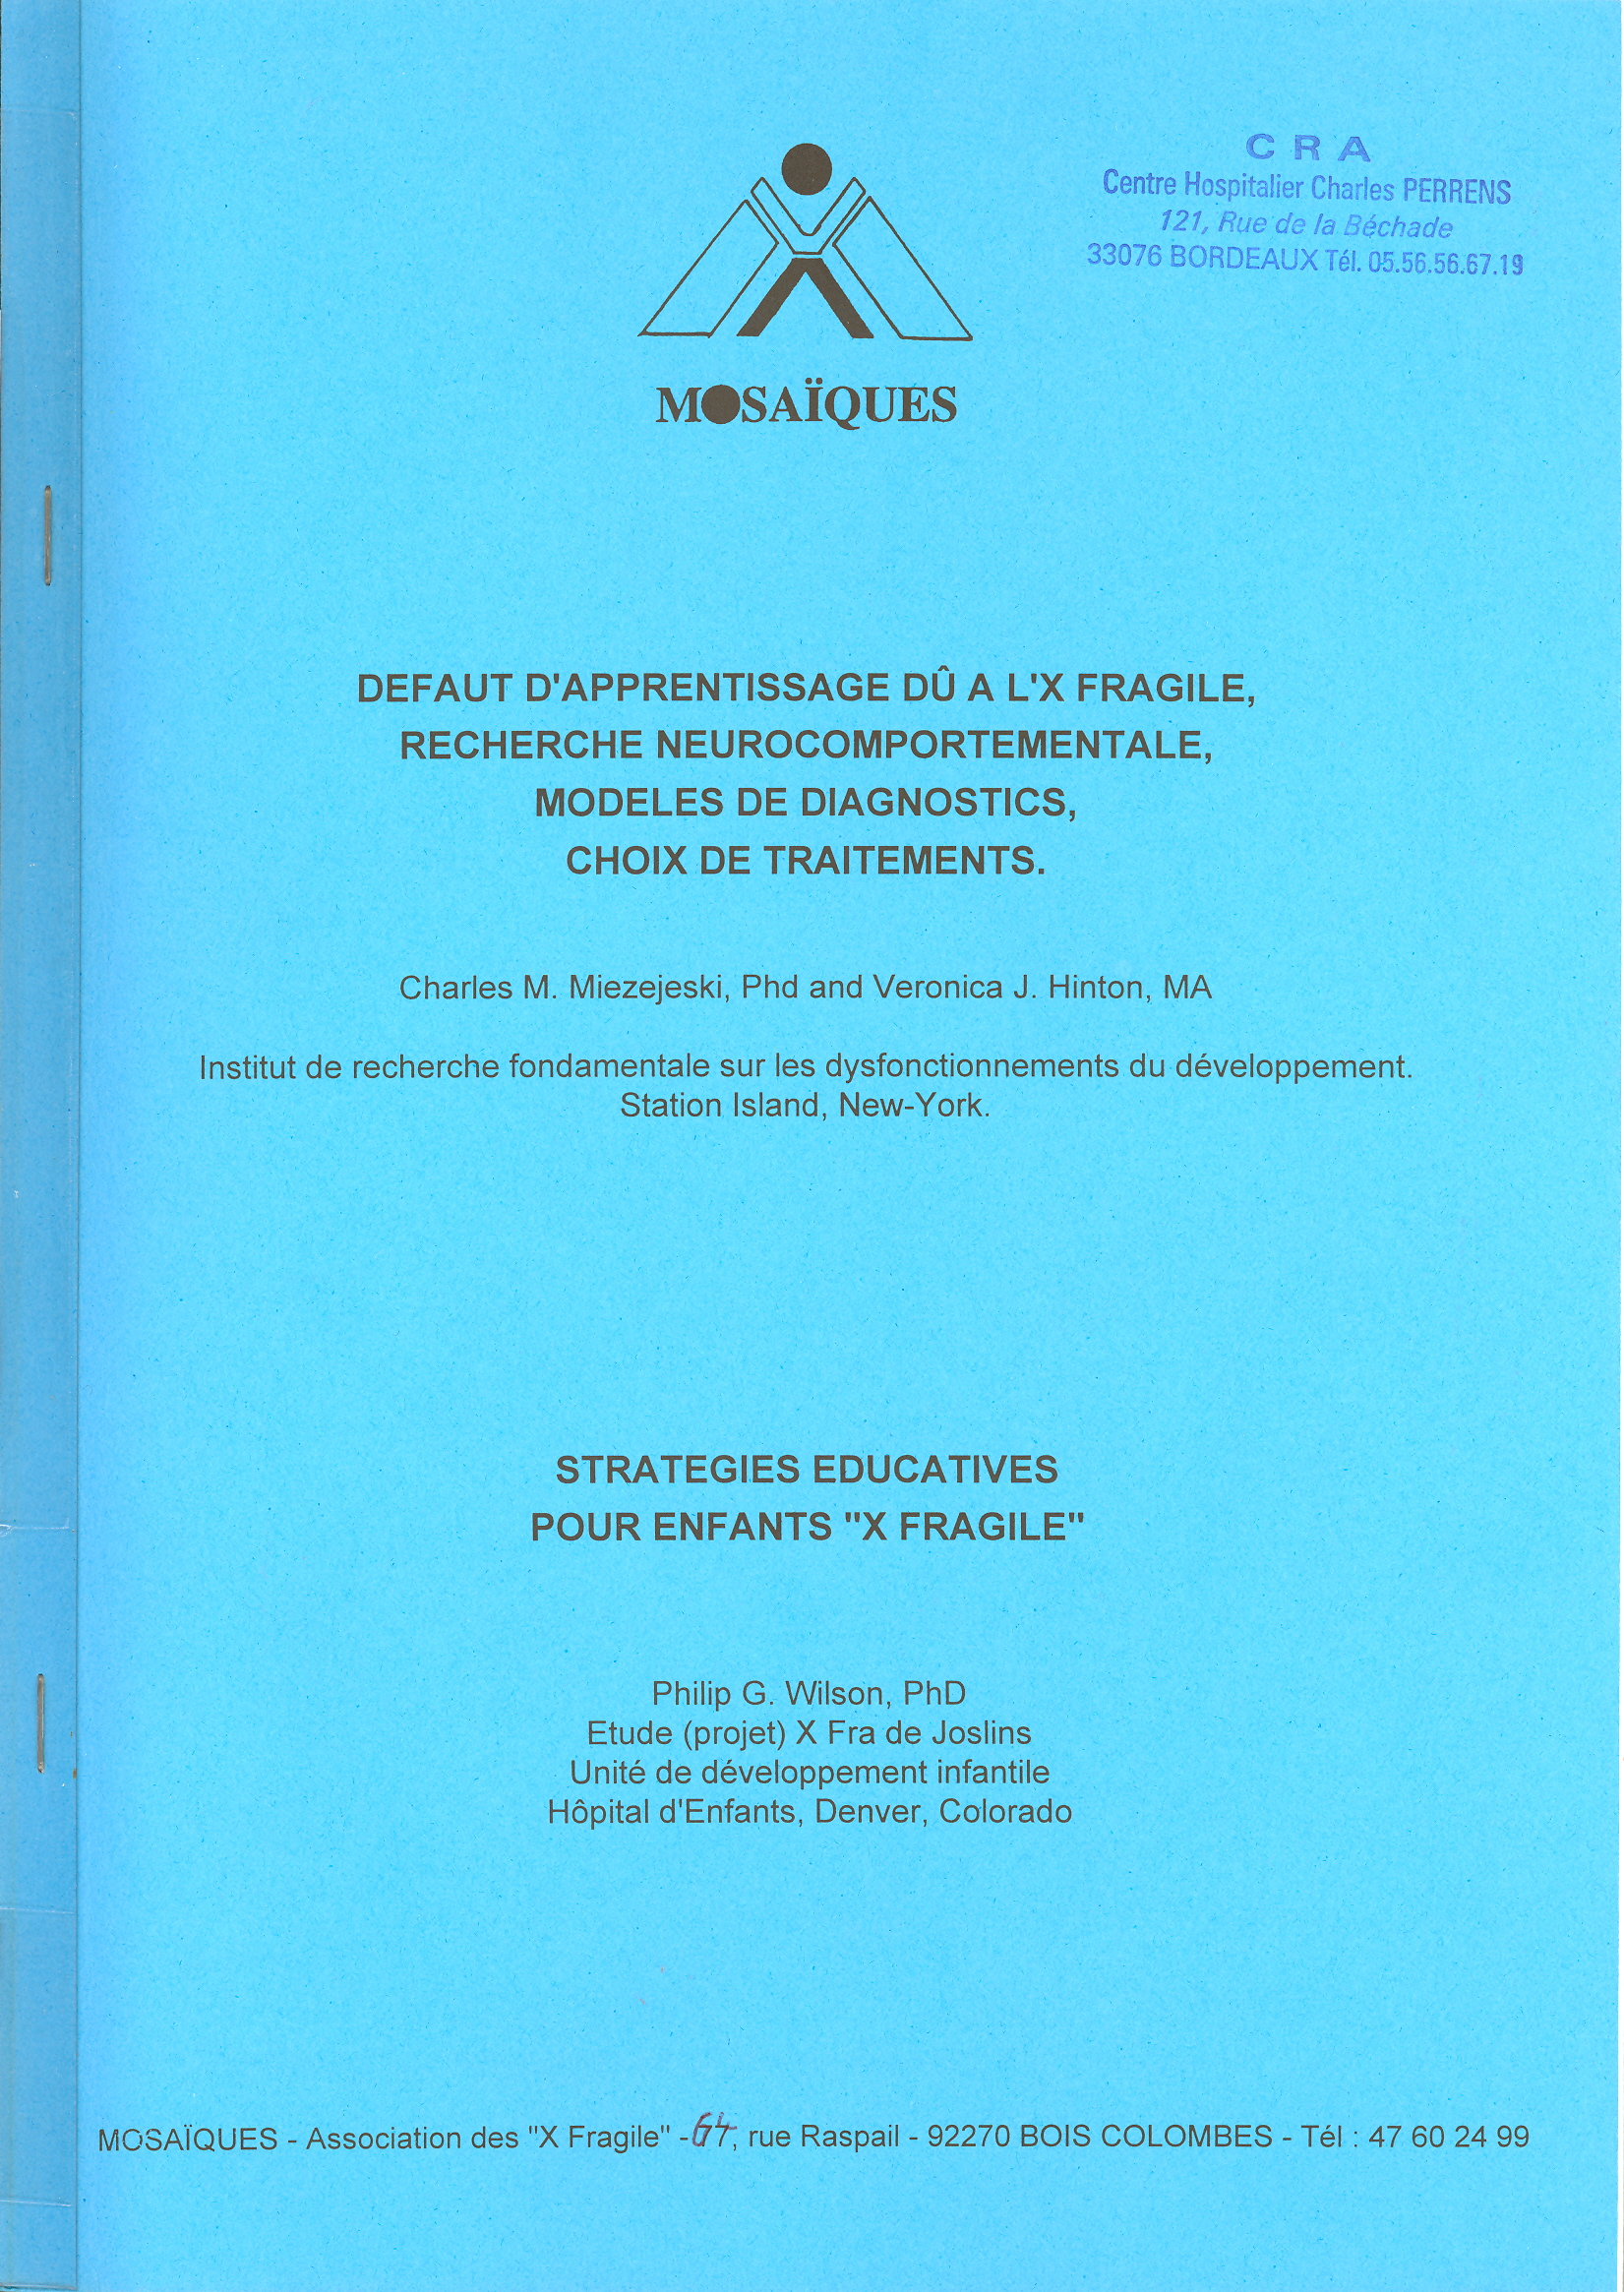 Conference internationale x fragile 1992